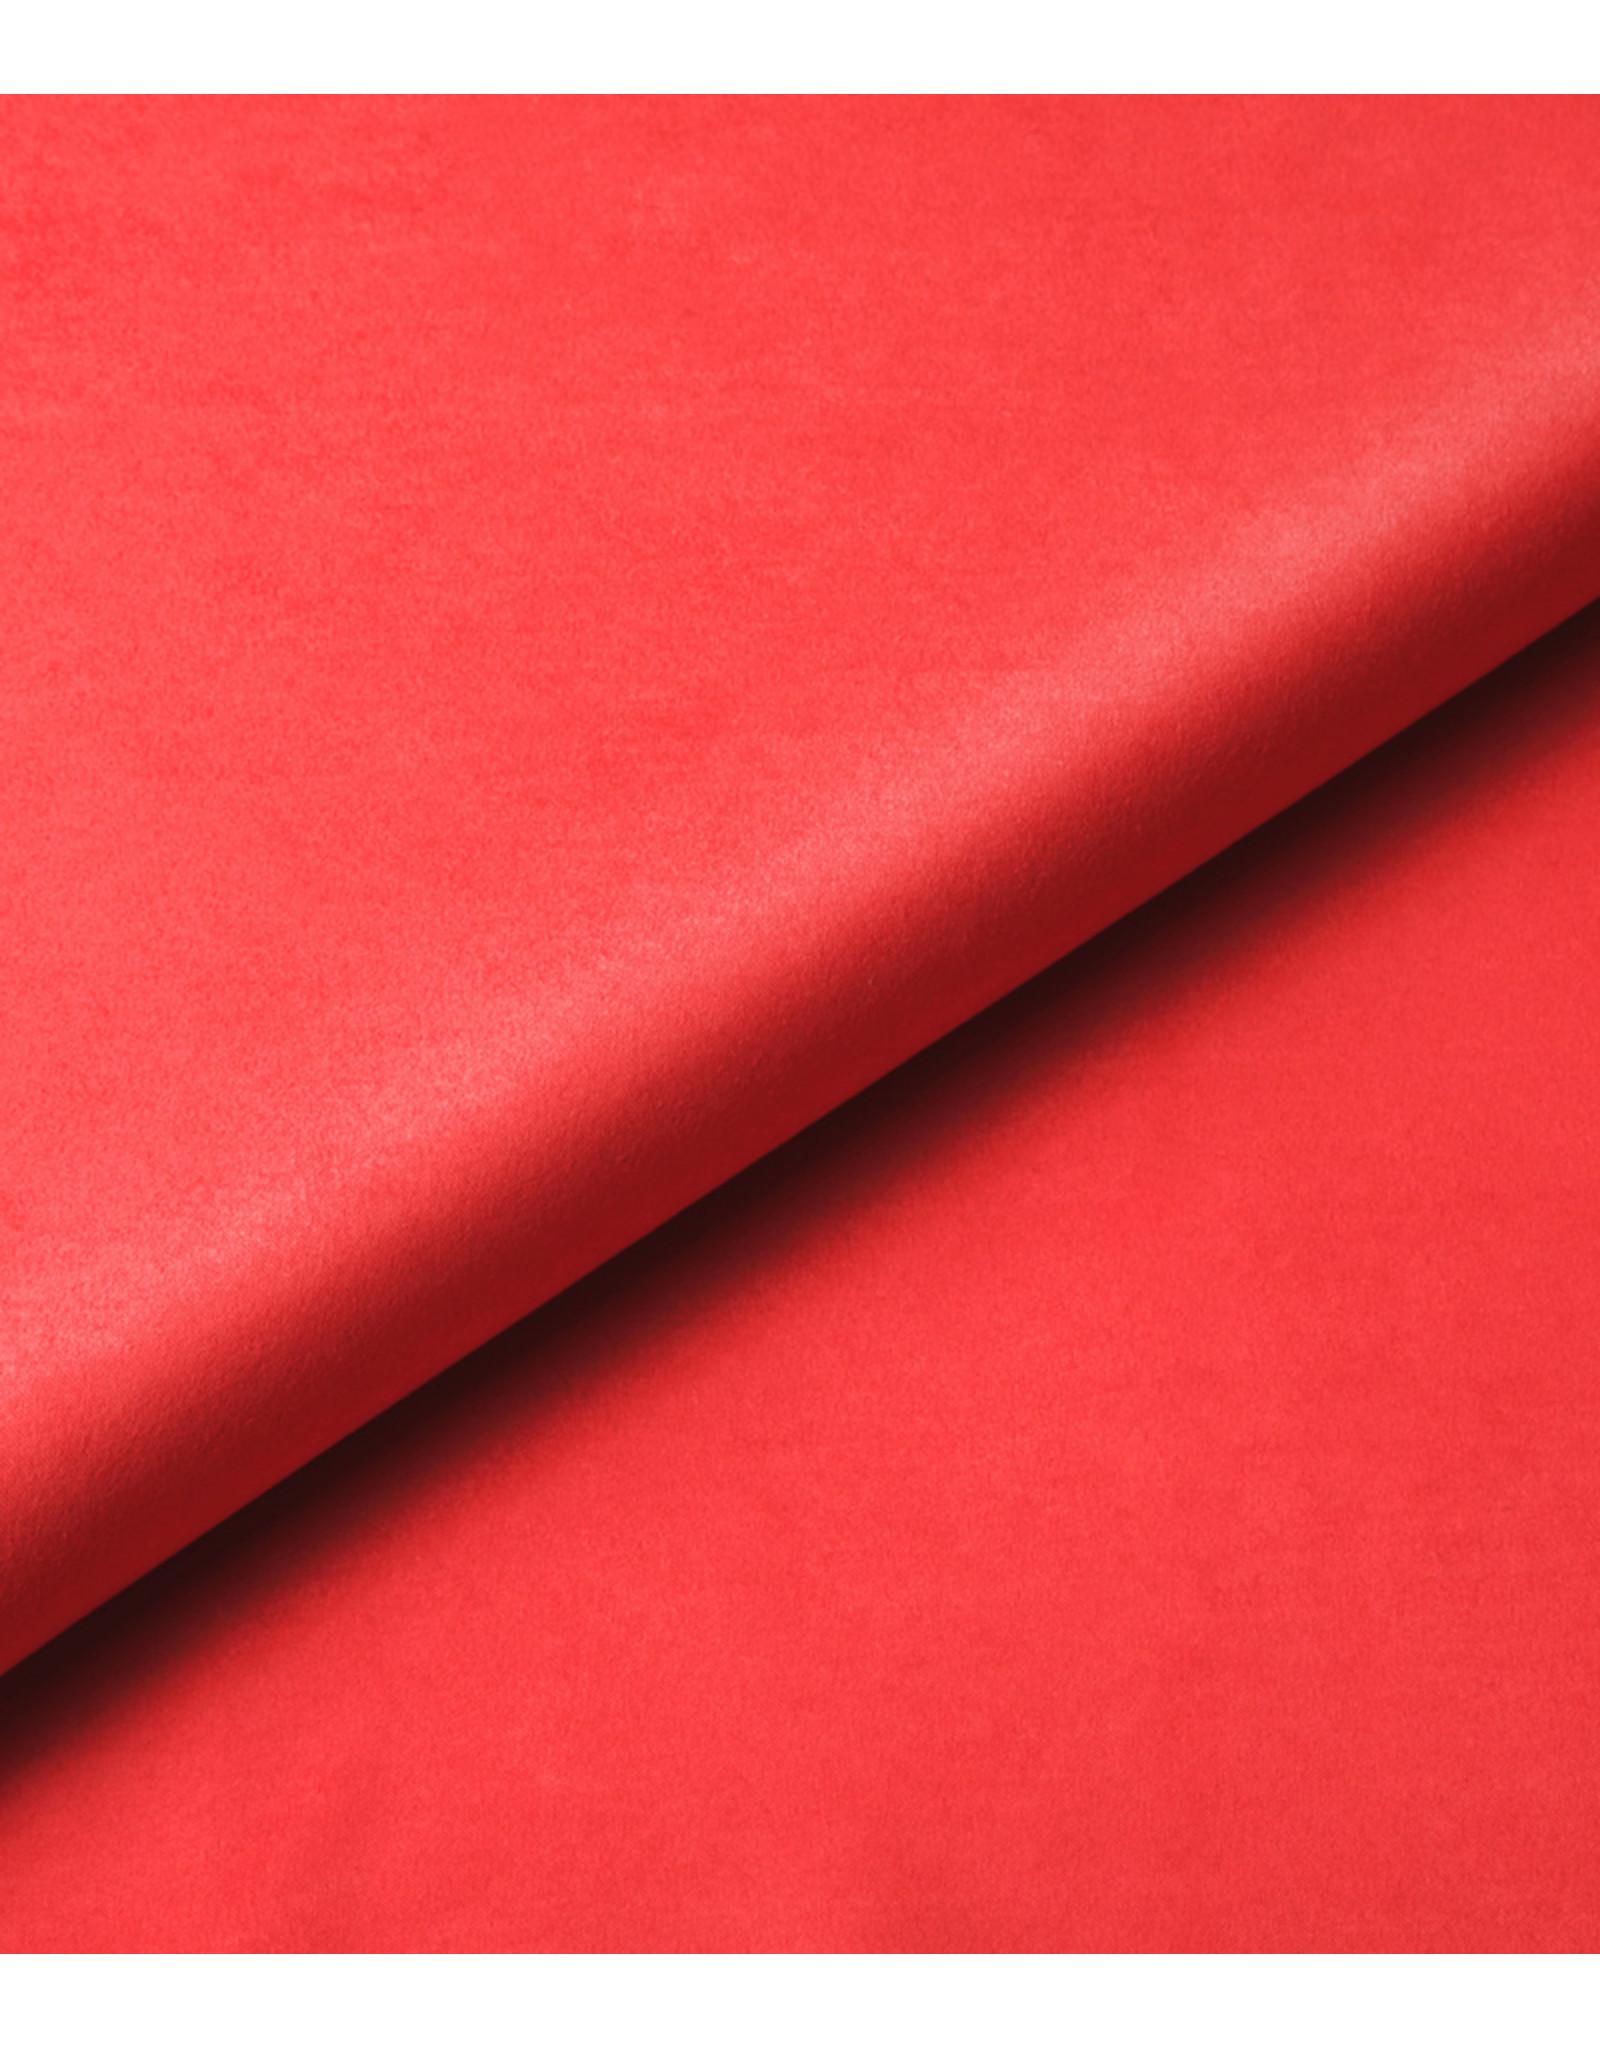 INVITALIS Vitalymed Soft - Rot